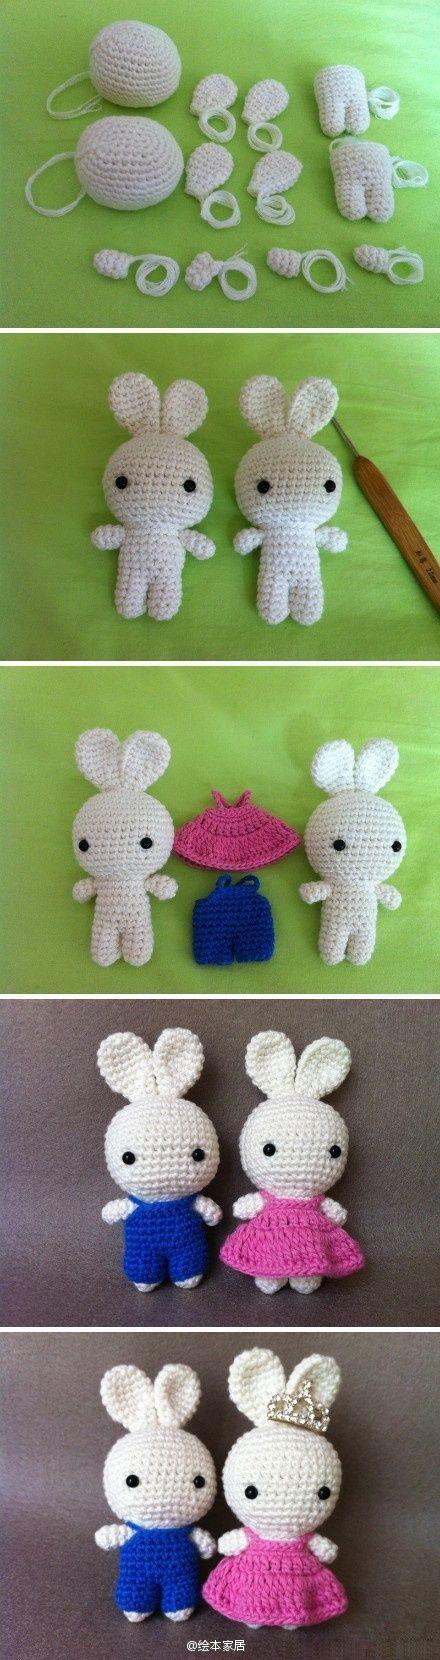 Petits lapins en crochet